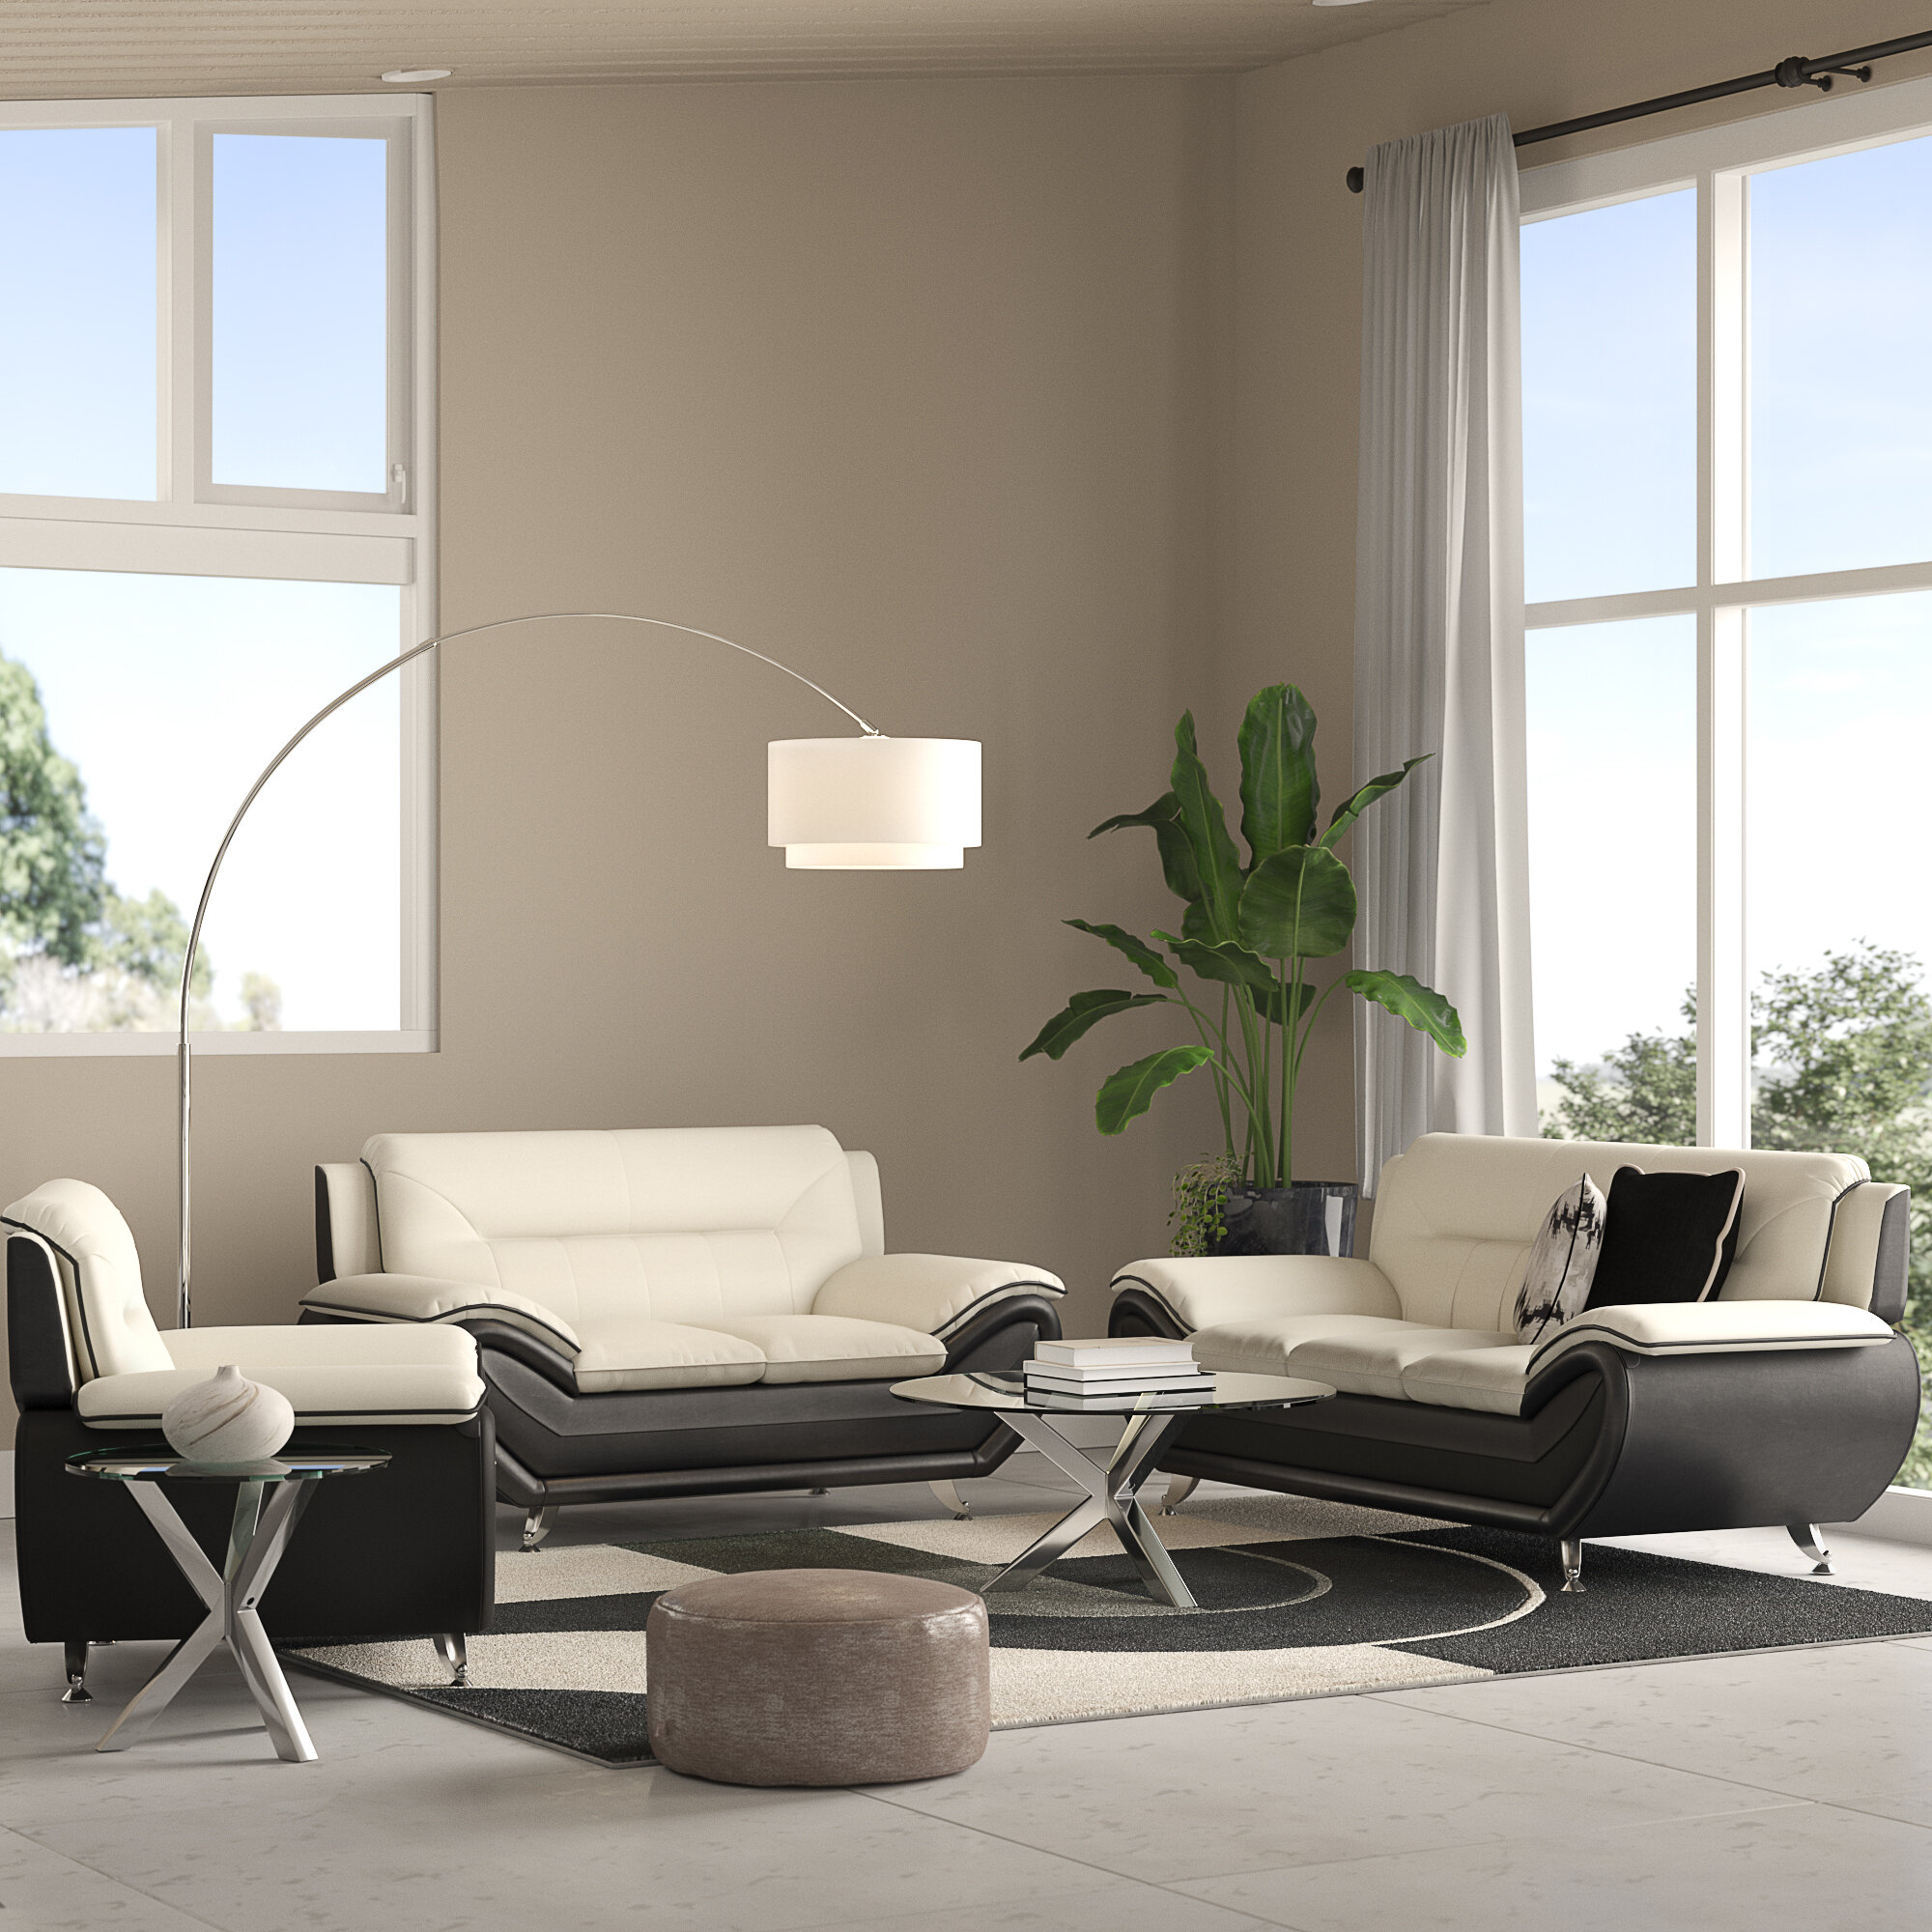 Orren Ellis Jasmin 3 Piece Living Room Set & Reviews | Wayfair